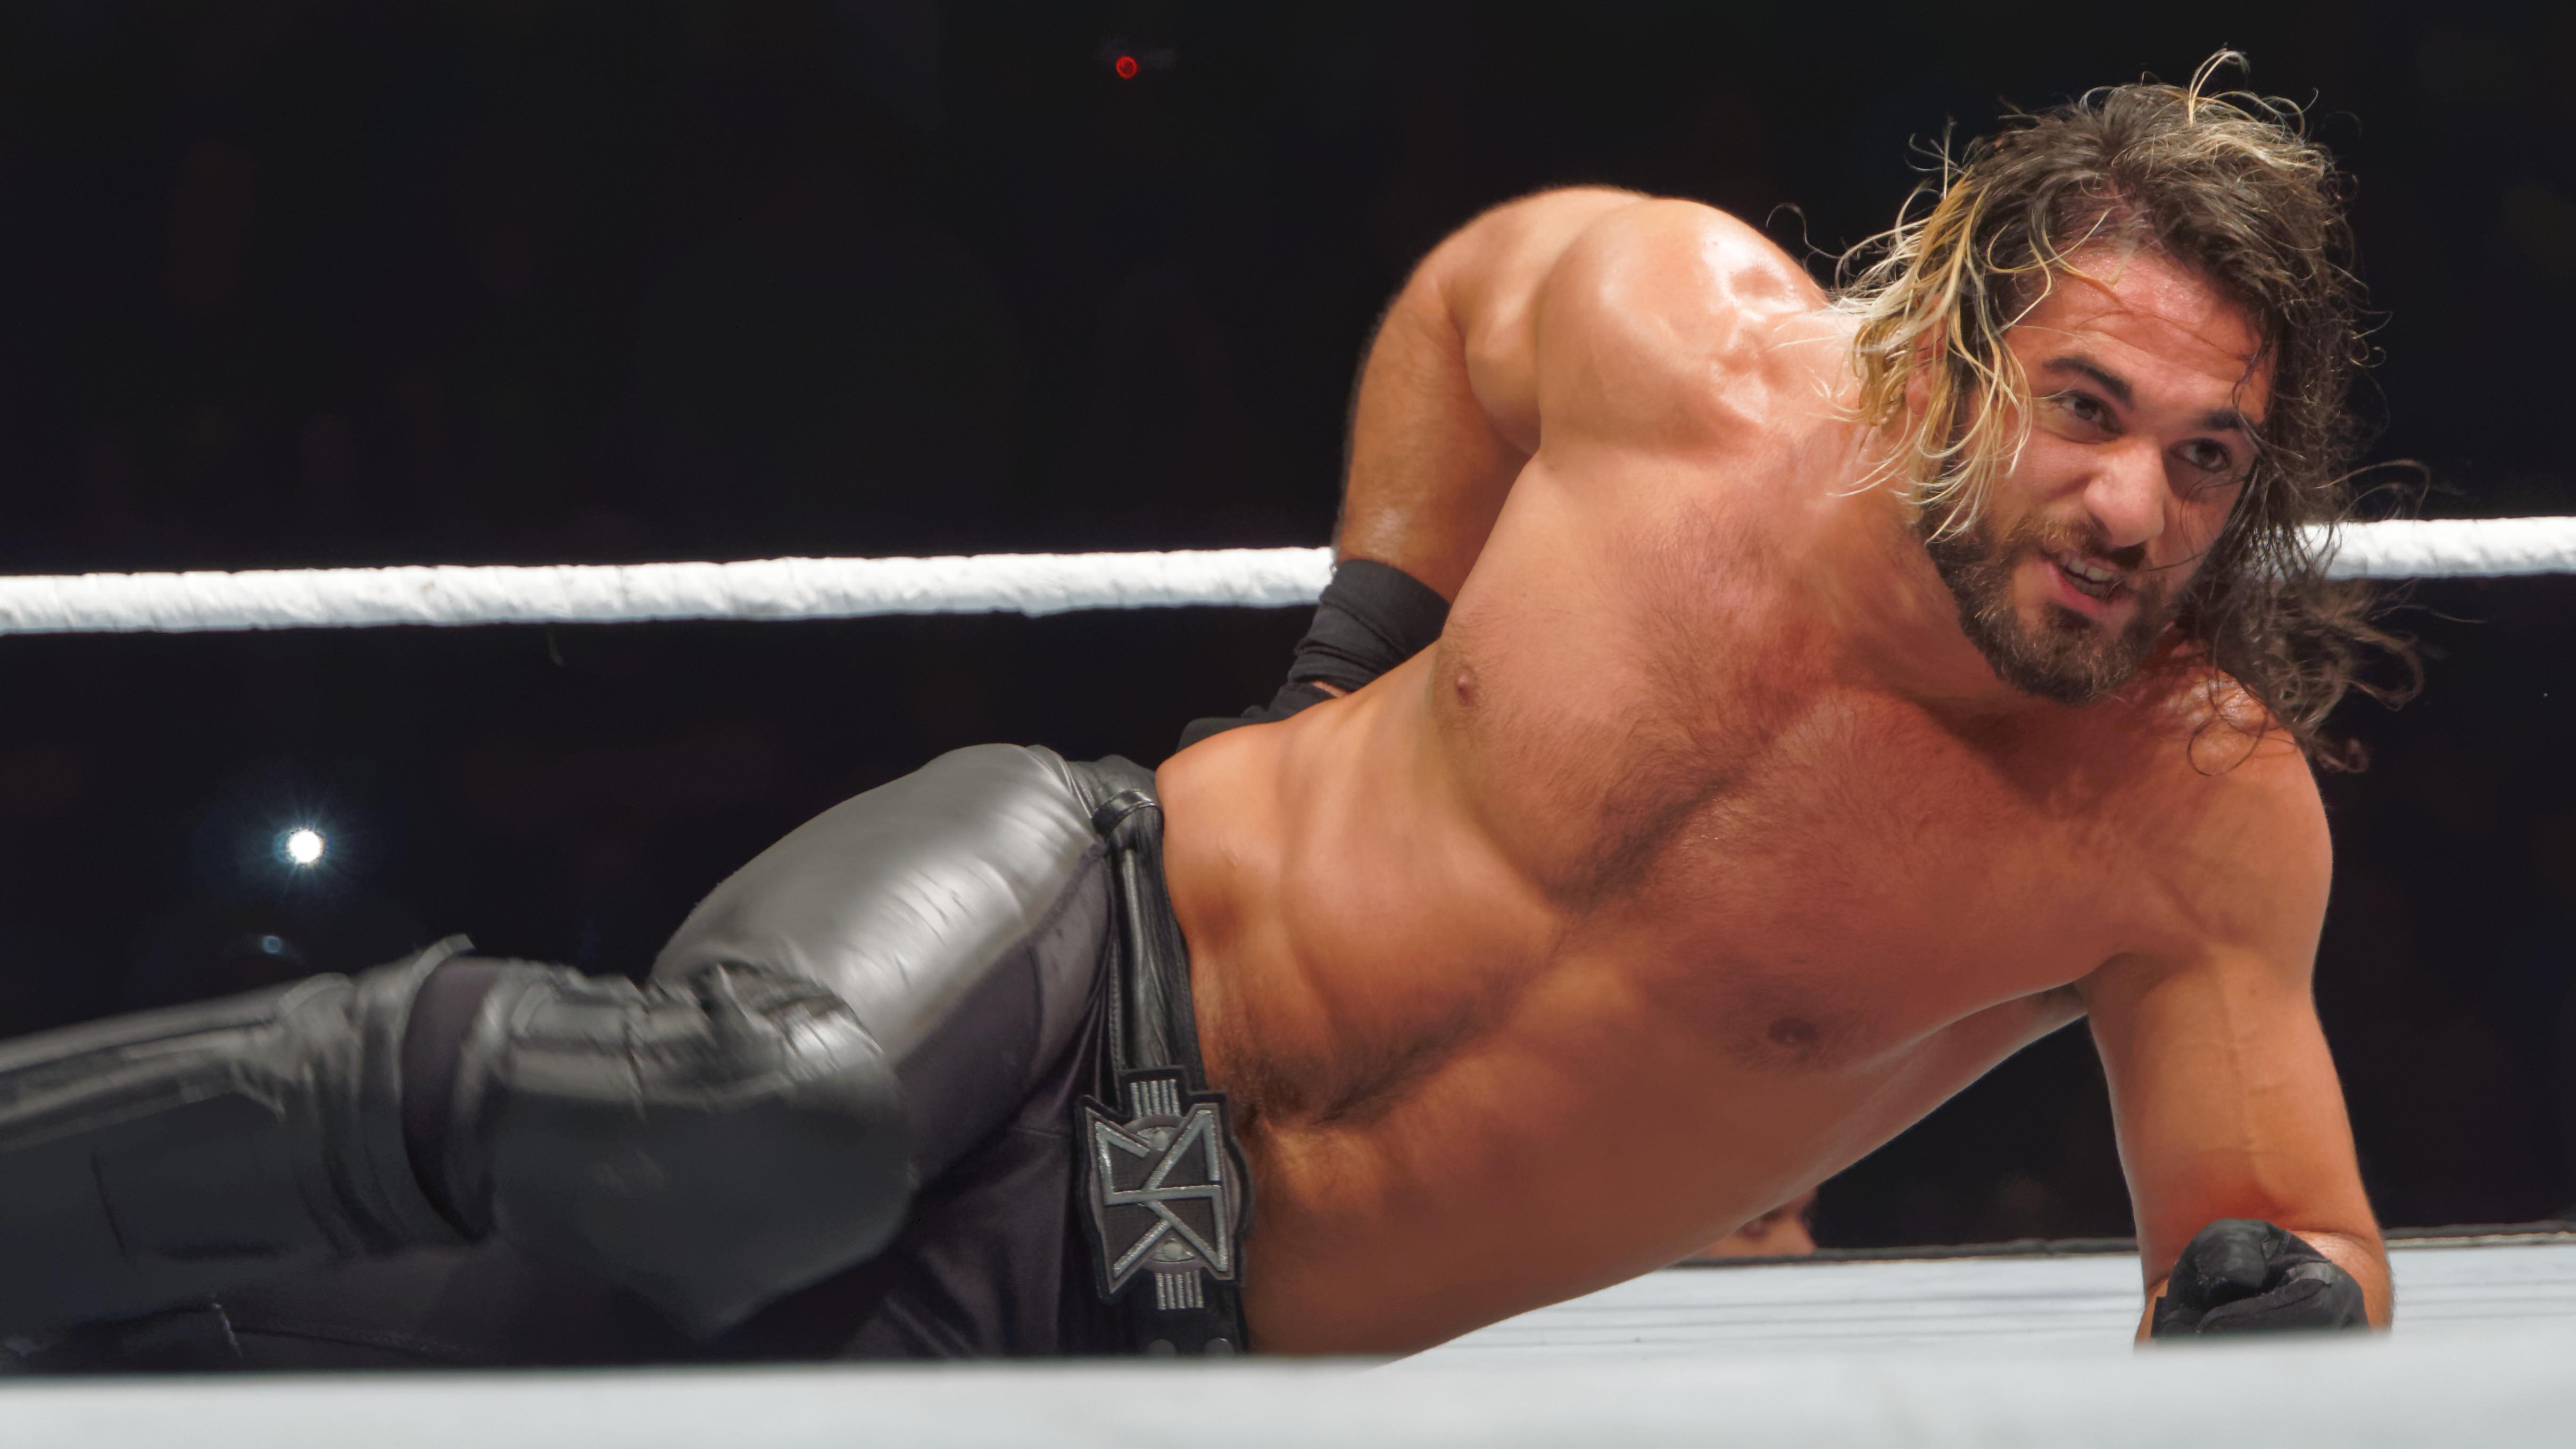 File:WWE Live 2015-04-17 22-31-09 ILCE-6000 1163 DxO (19740264466 ...